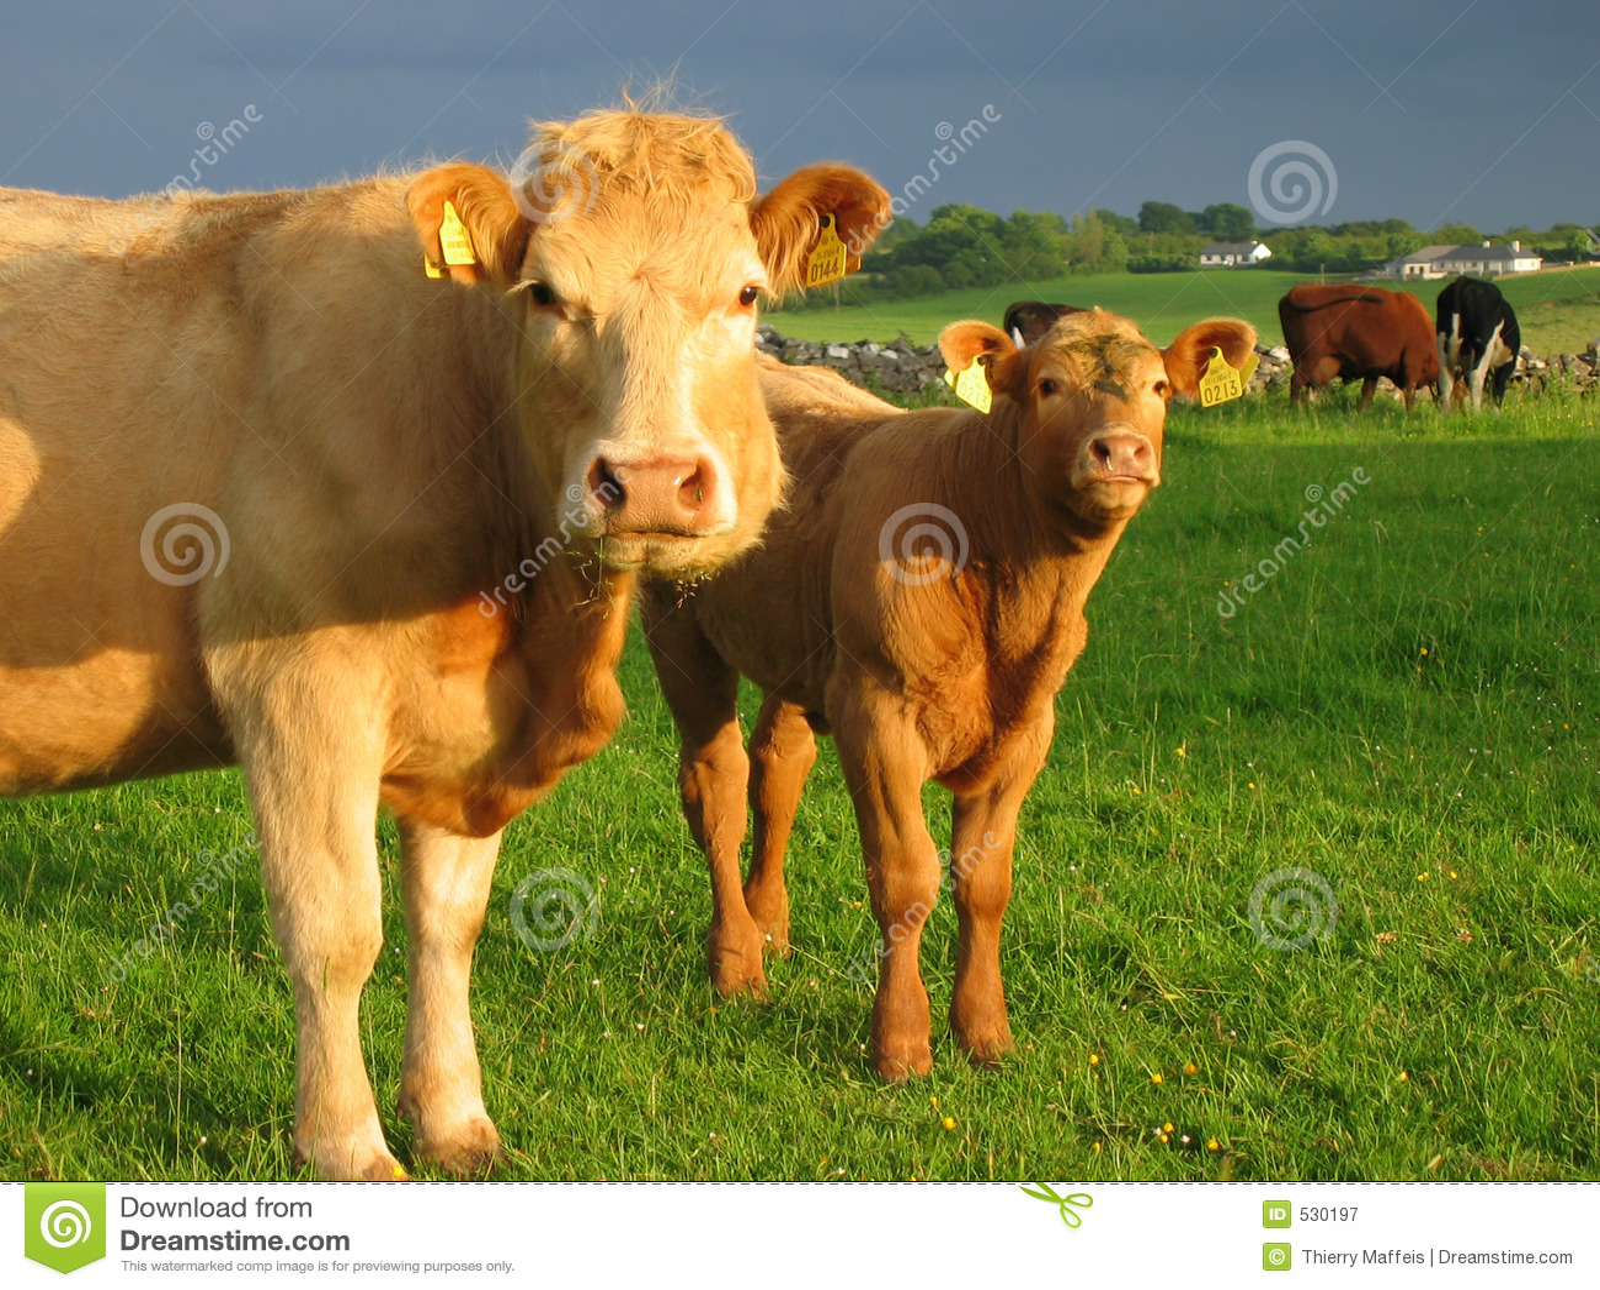 Download 威胁爱尔兰语 库存图片. 图片 包括有 小牛, 肥沃, 贝多芬, 国内, 横向, 交配动物者, 爱尔兰语, 问题的 - 530197